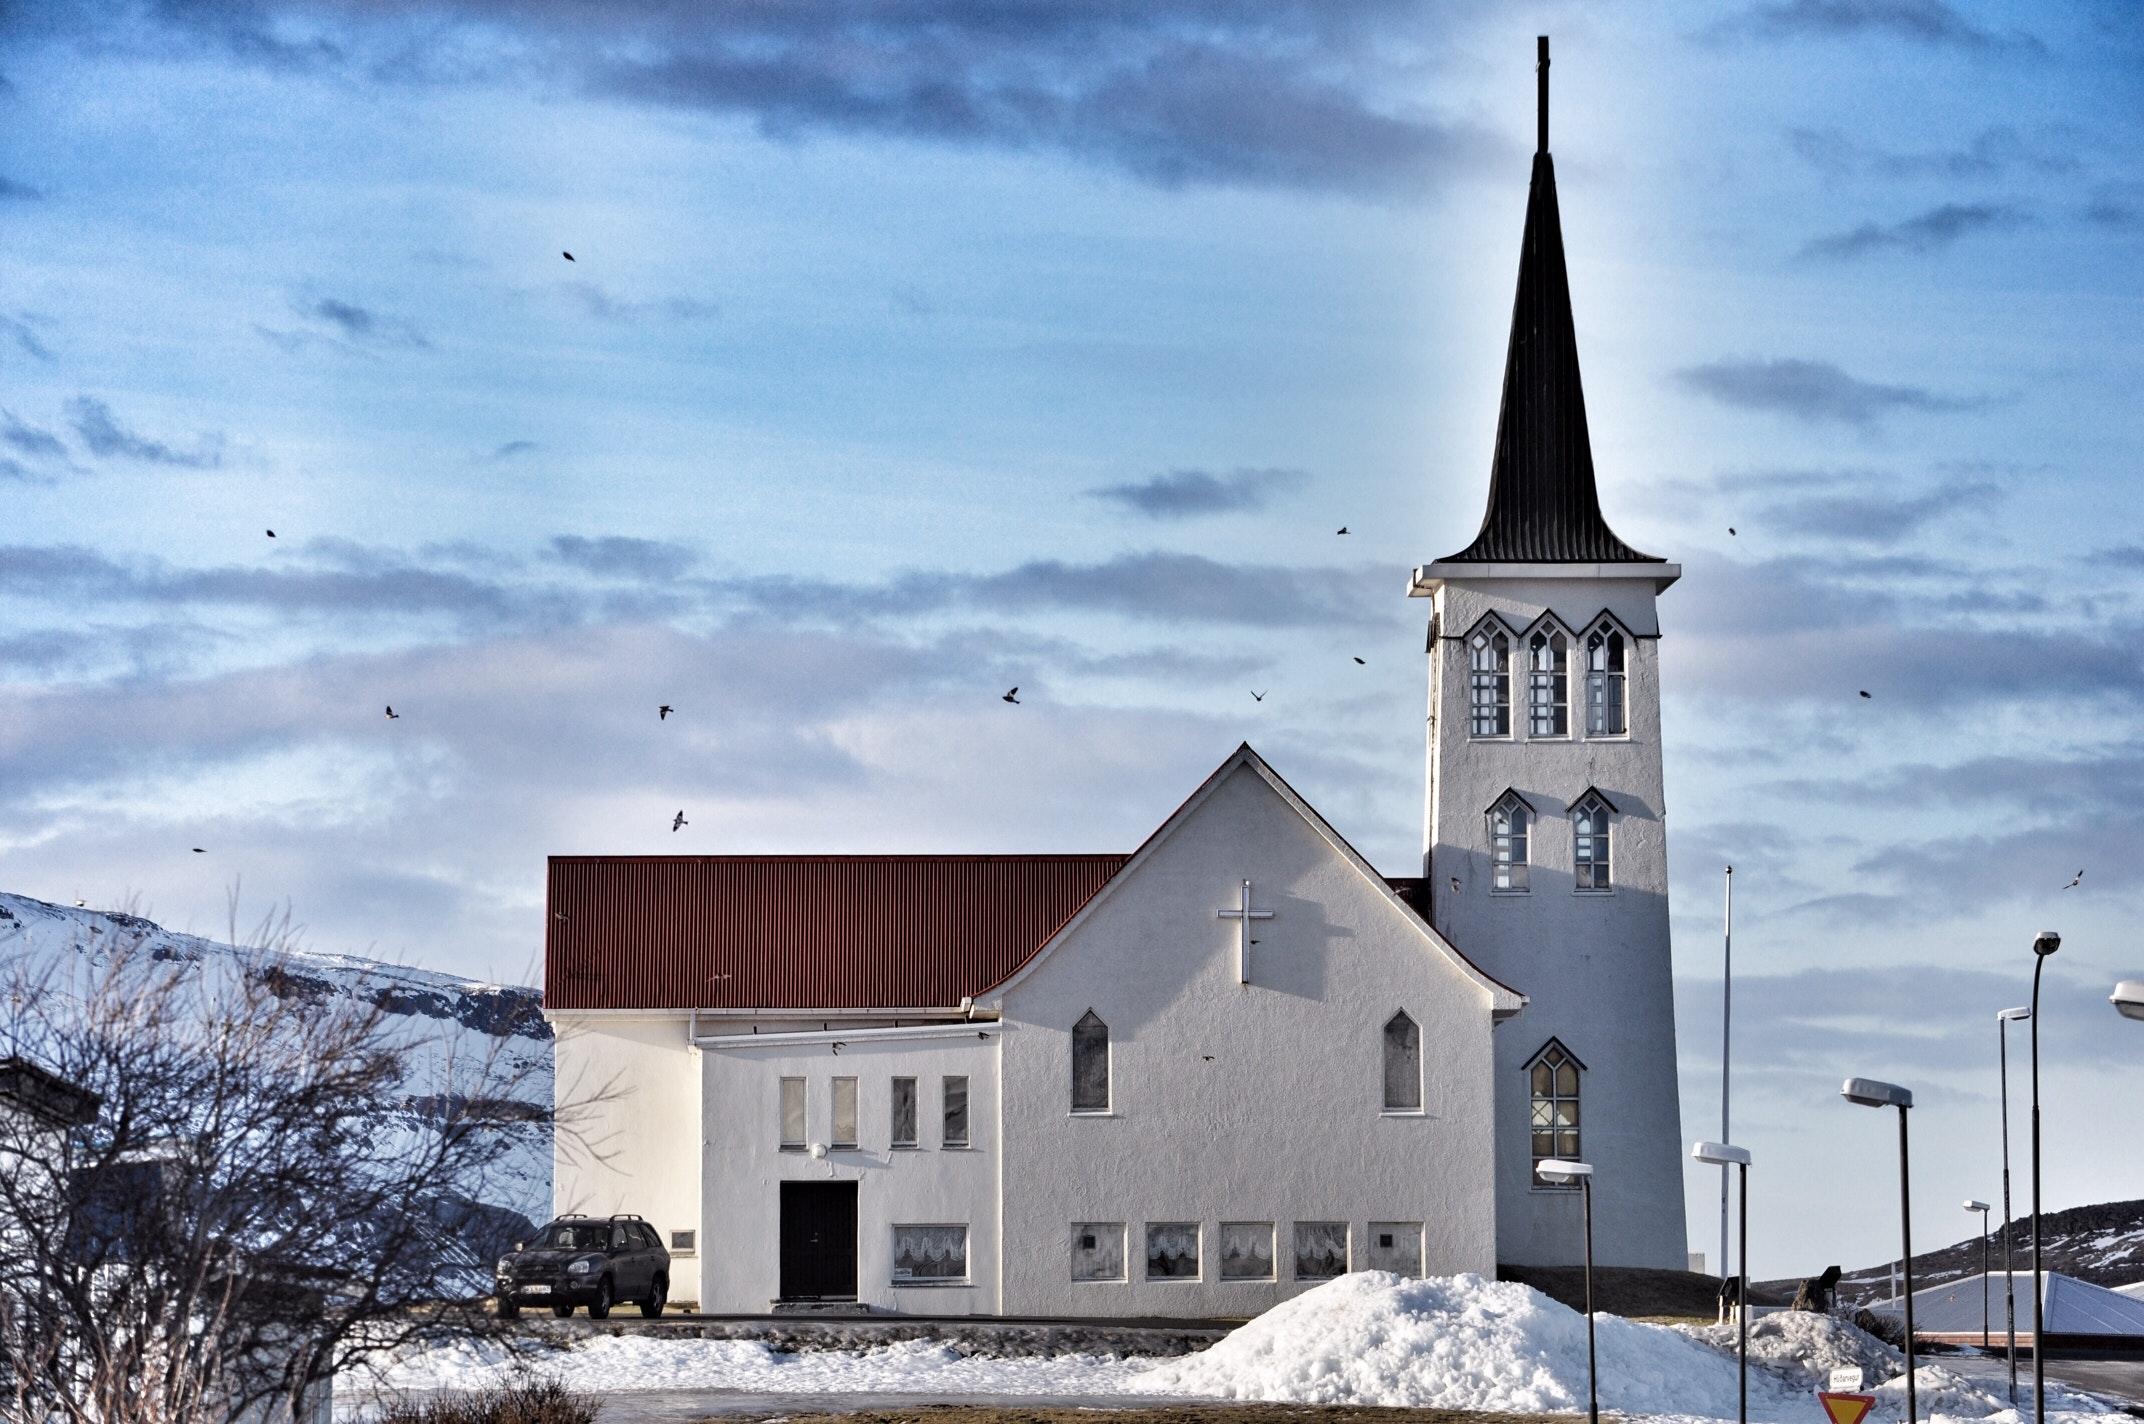 The church in Grundarfjörður on Snæfellsnes Peninsula in west Iceland